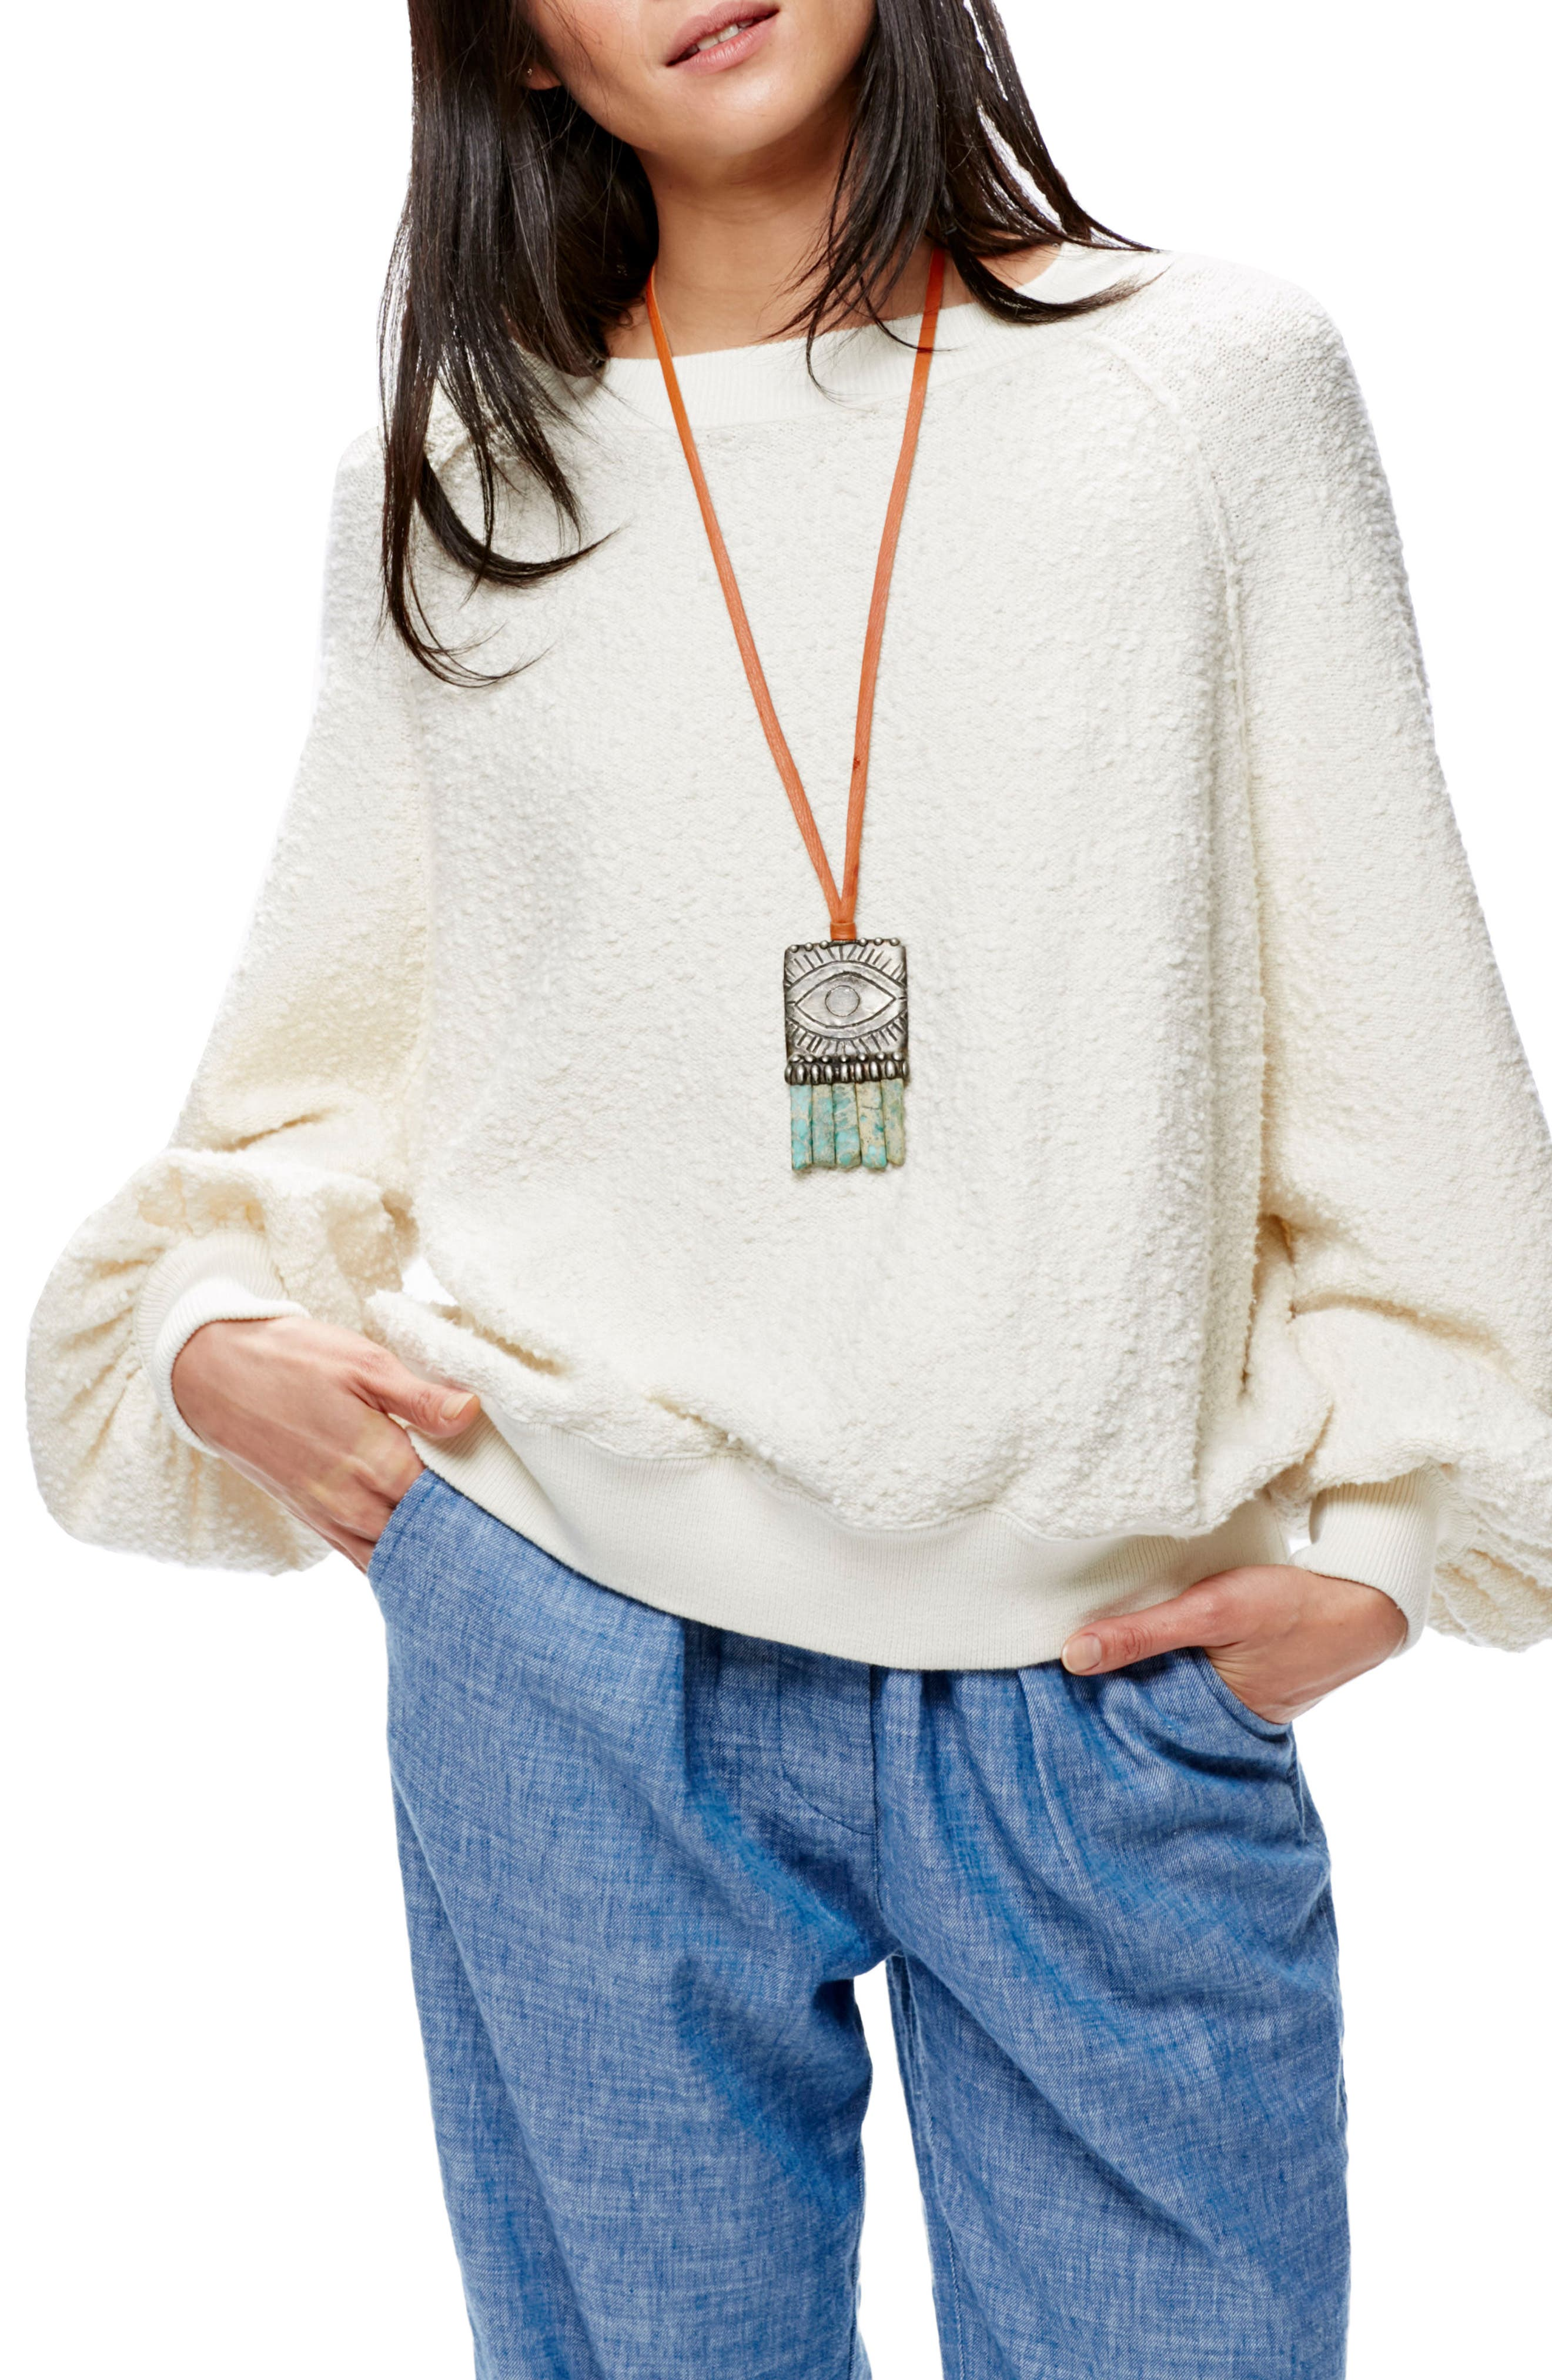 Found My Friend Sweatshirt,                             Main thumbnail 1, color,                             IVORY